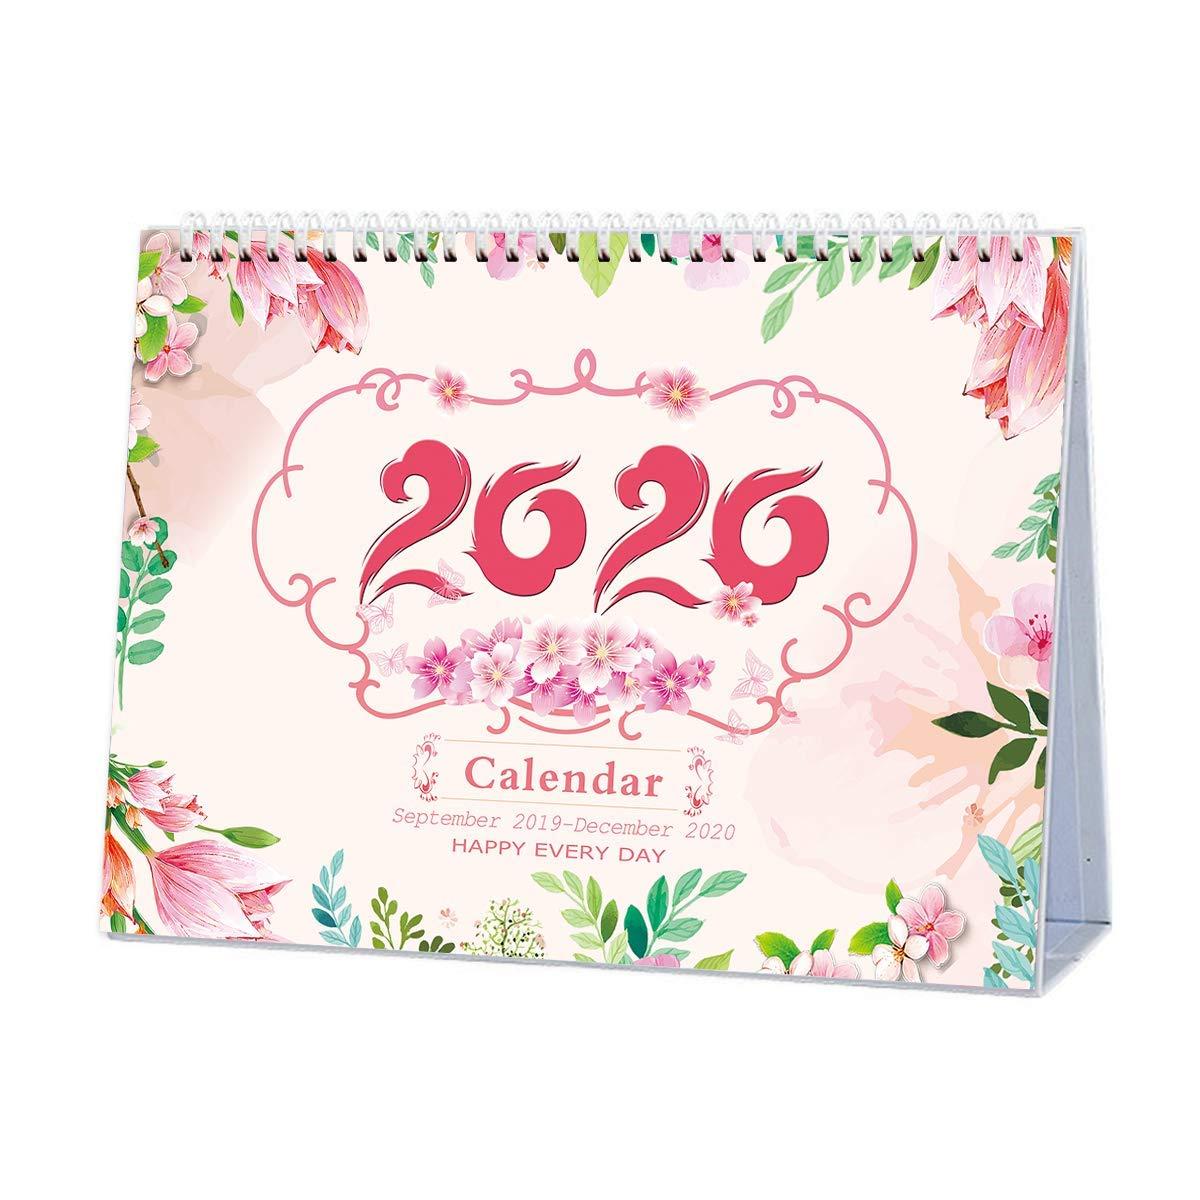 Standing Desk Calendar 2019-2020 Unique Monthly Designs, Double-Sided, Use Desktop Calendar September 2019 to December 2020, Tent Calendar, Flip Calender, Easel Calandar, Table Top Calendar